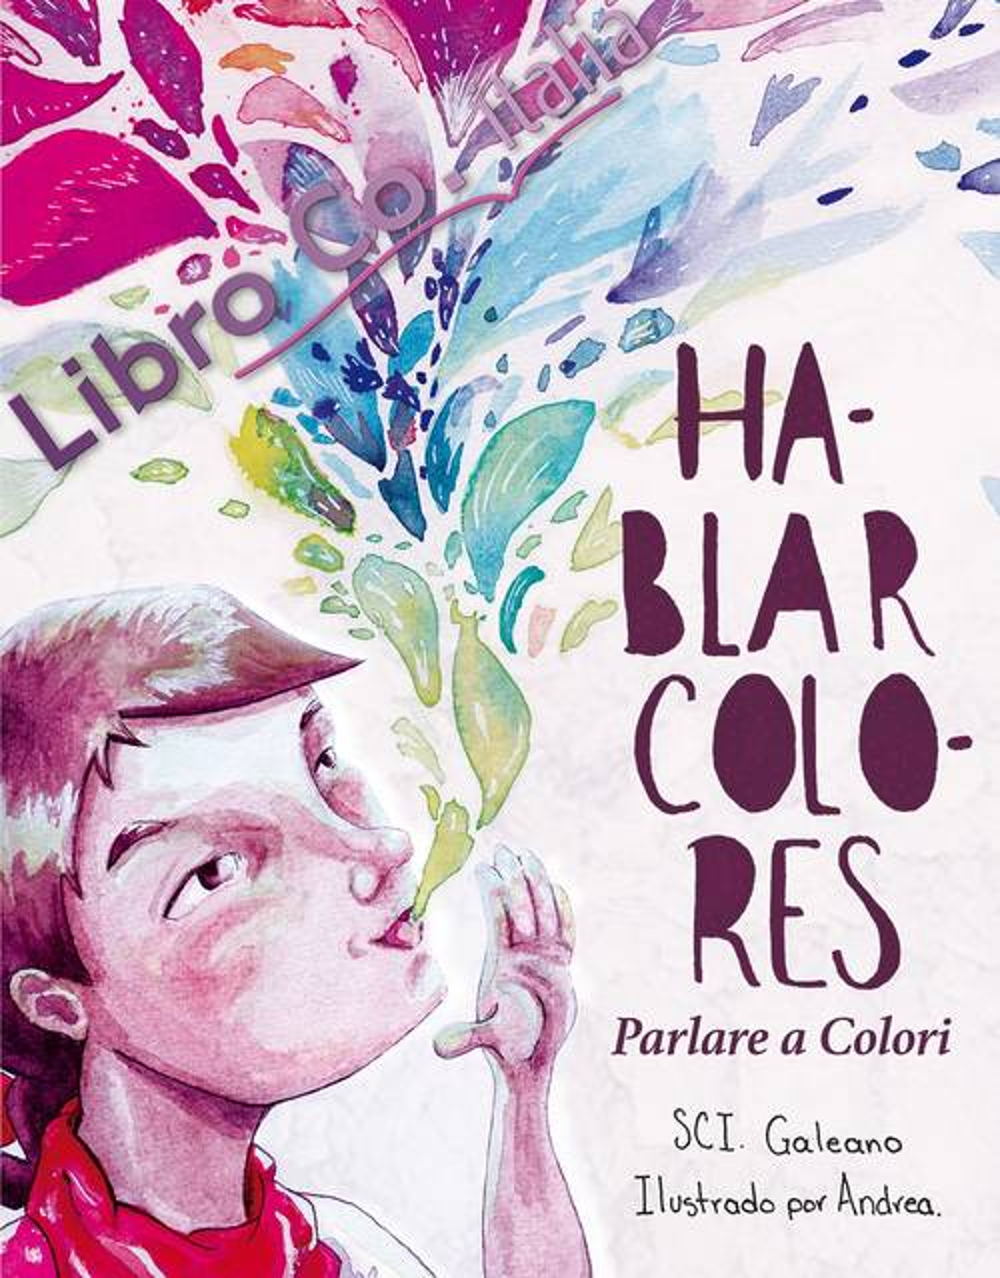 Hablar colores. Parlare a colori